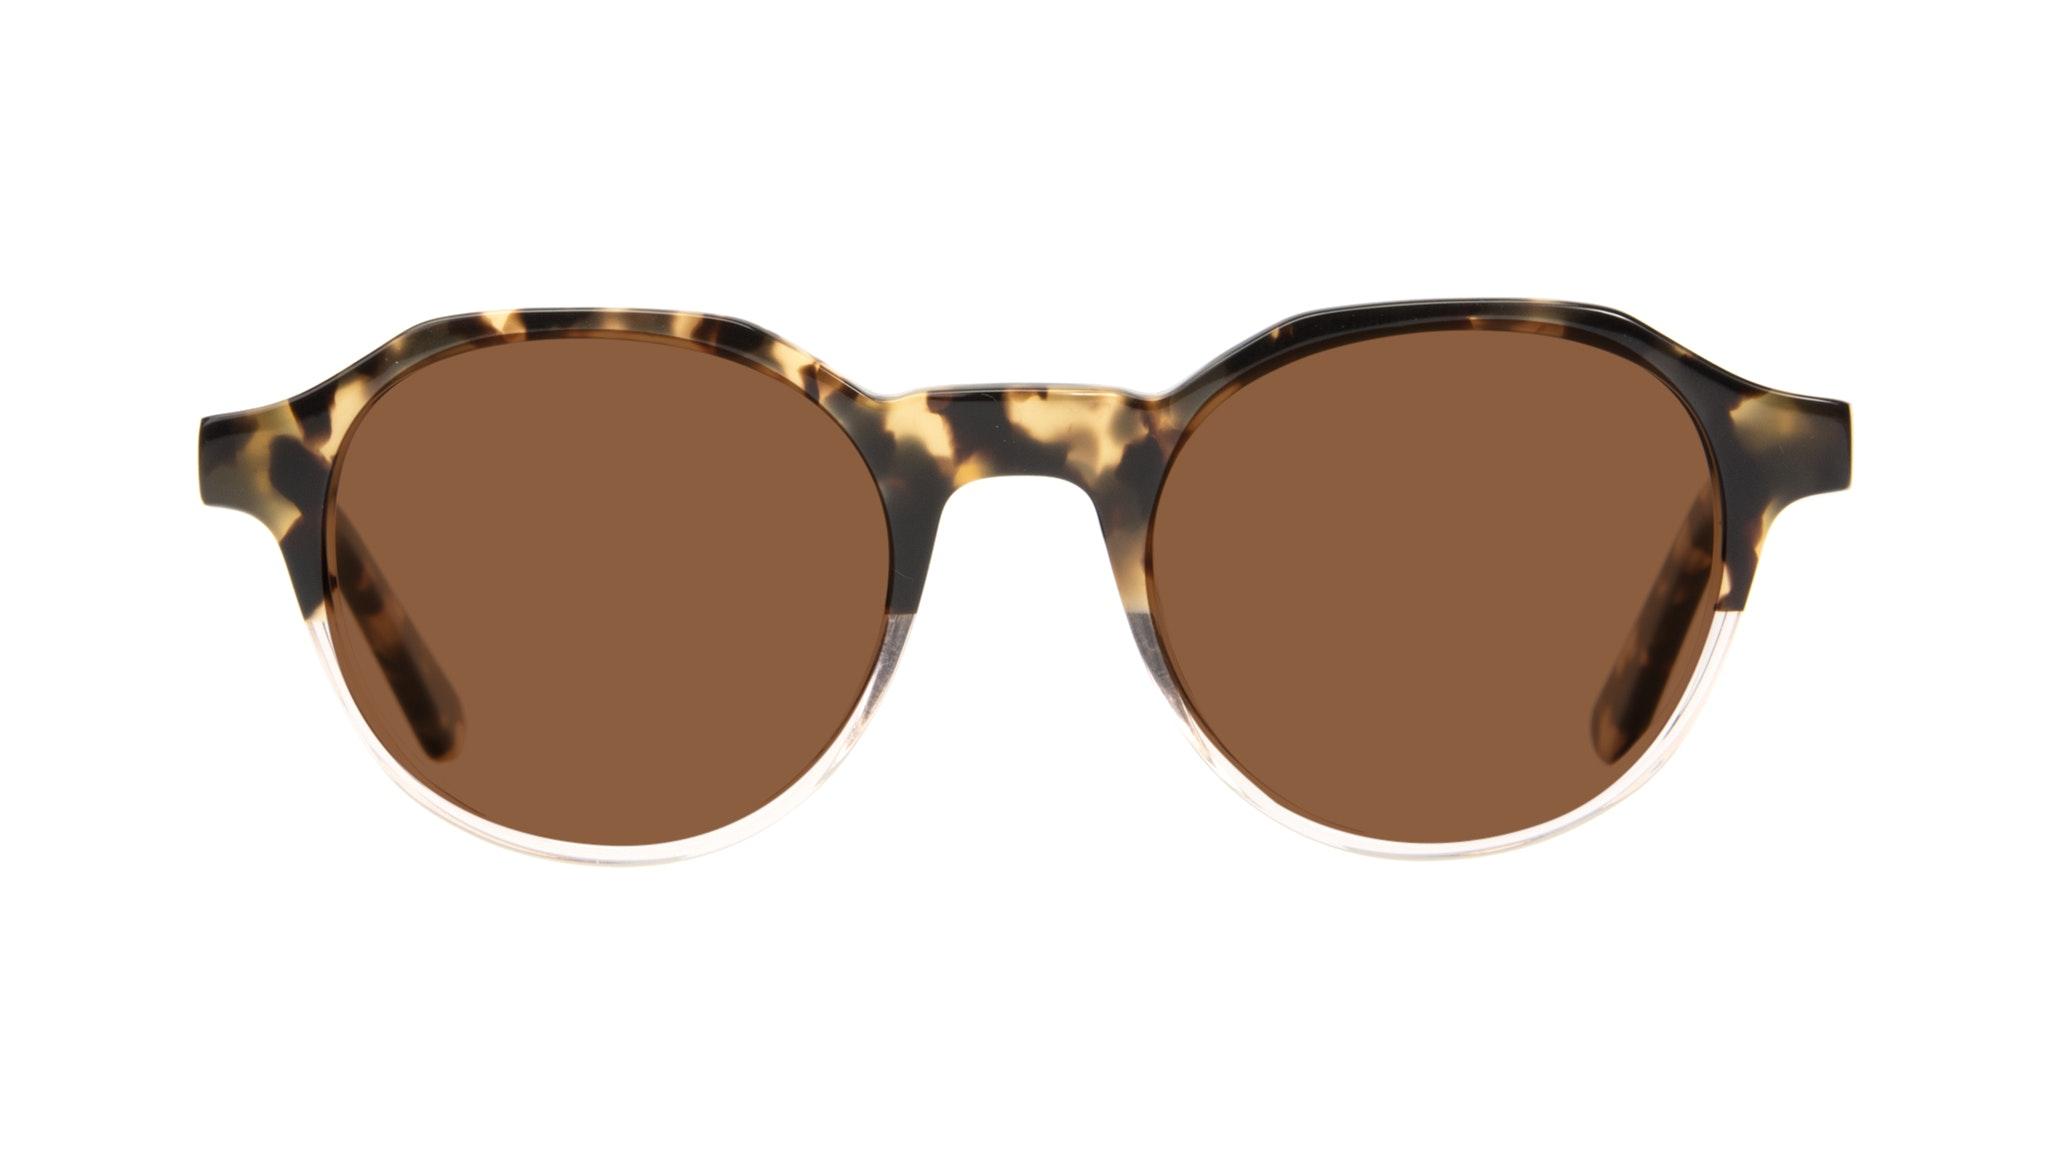 Affordable Fashion Glasses Round Sunglasses Men Form Golden Tort Front